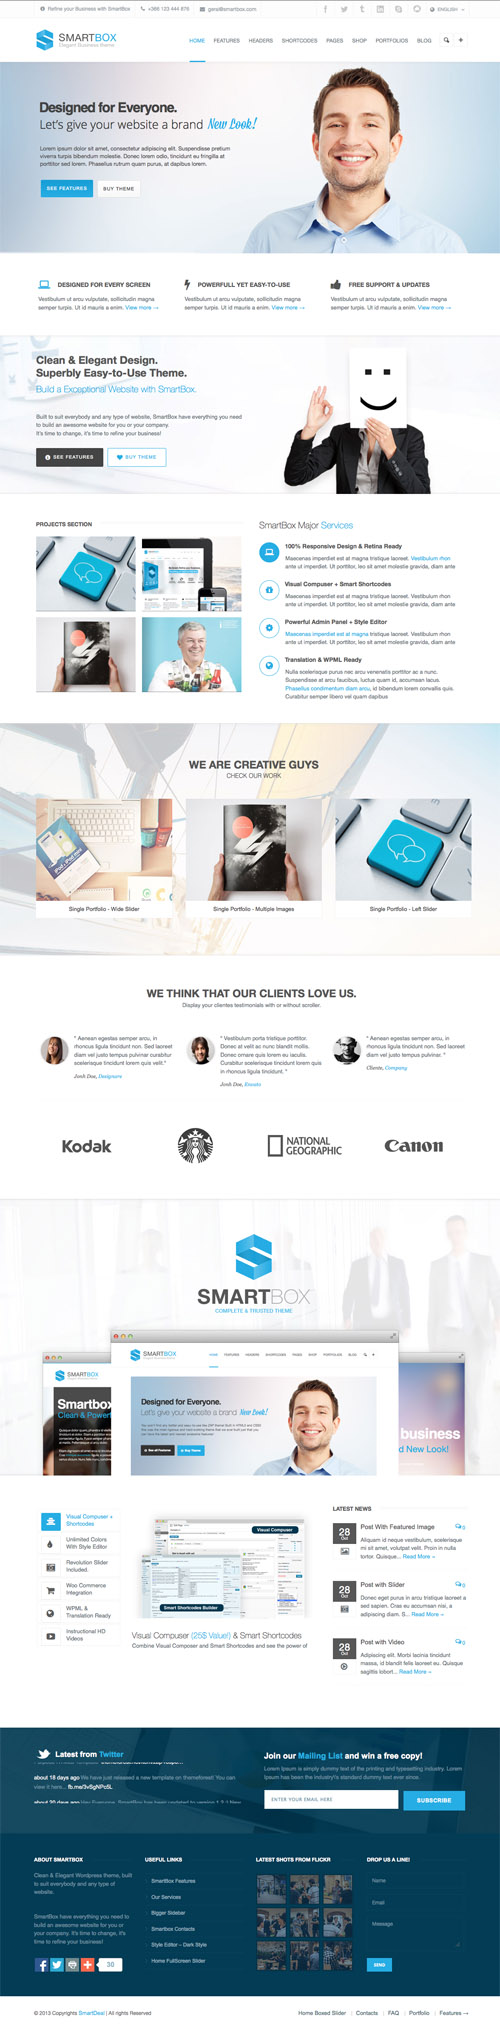 SmartBox PSD Template